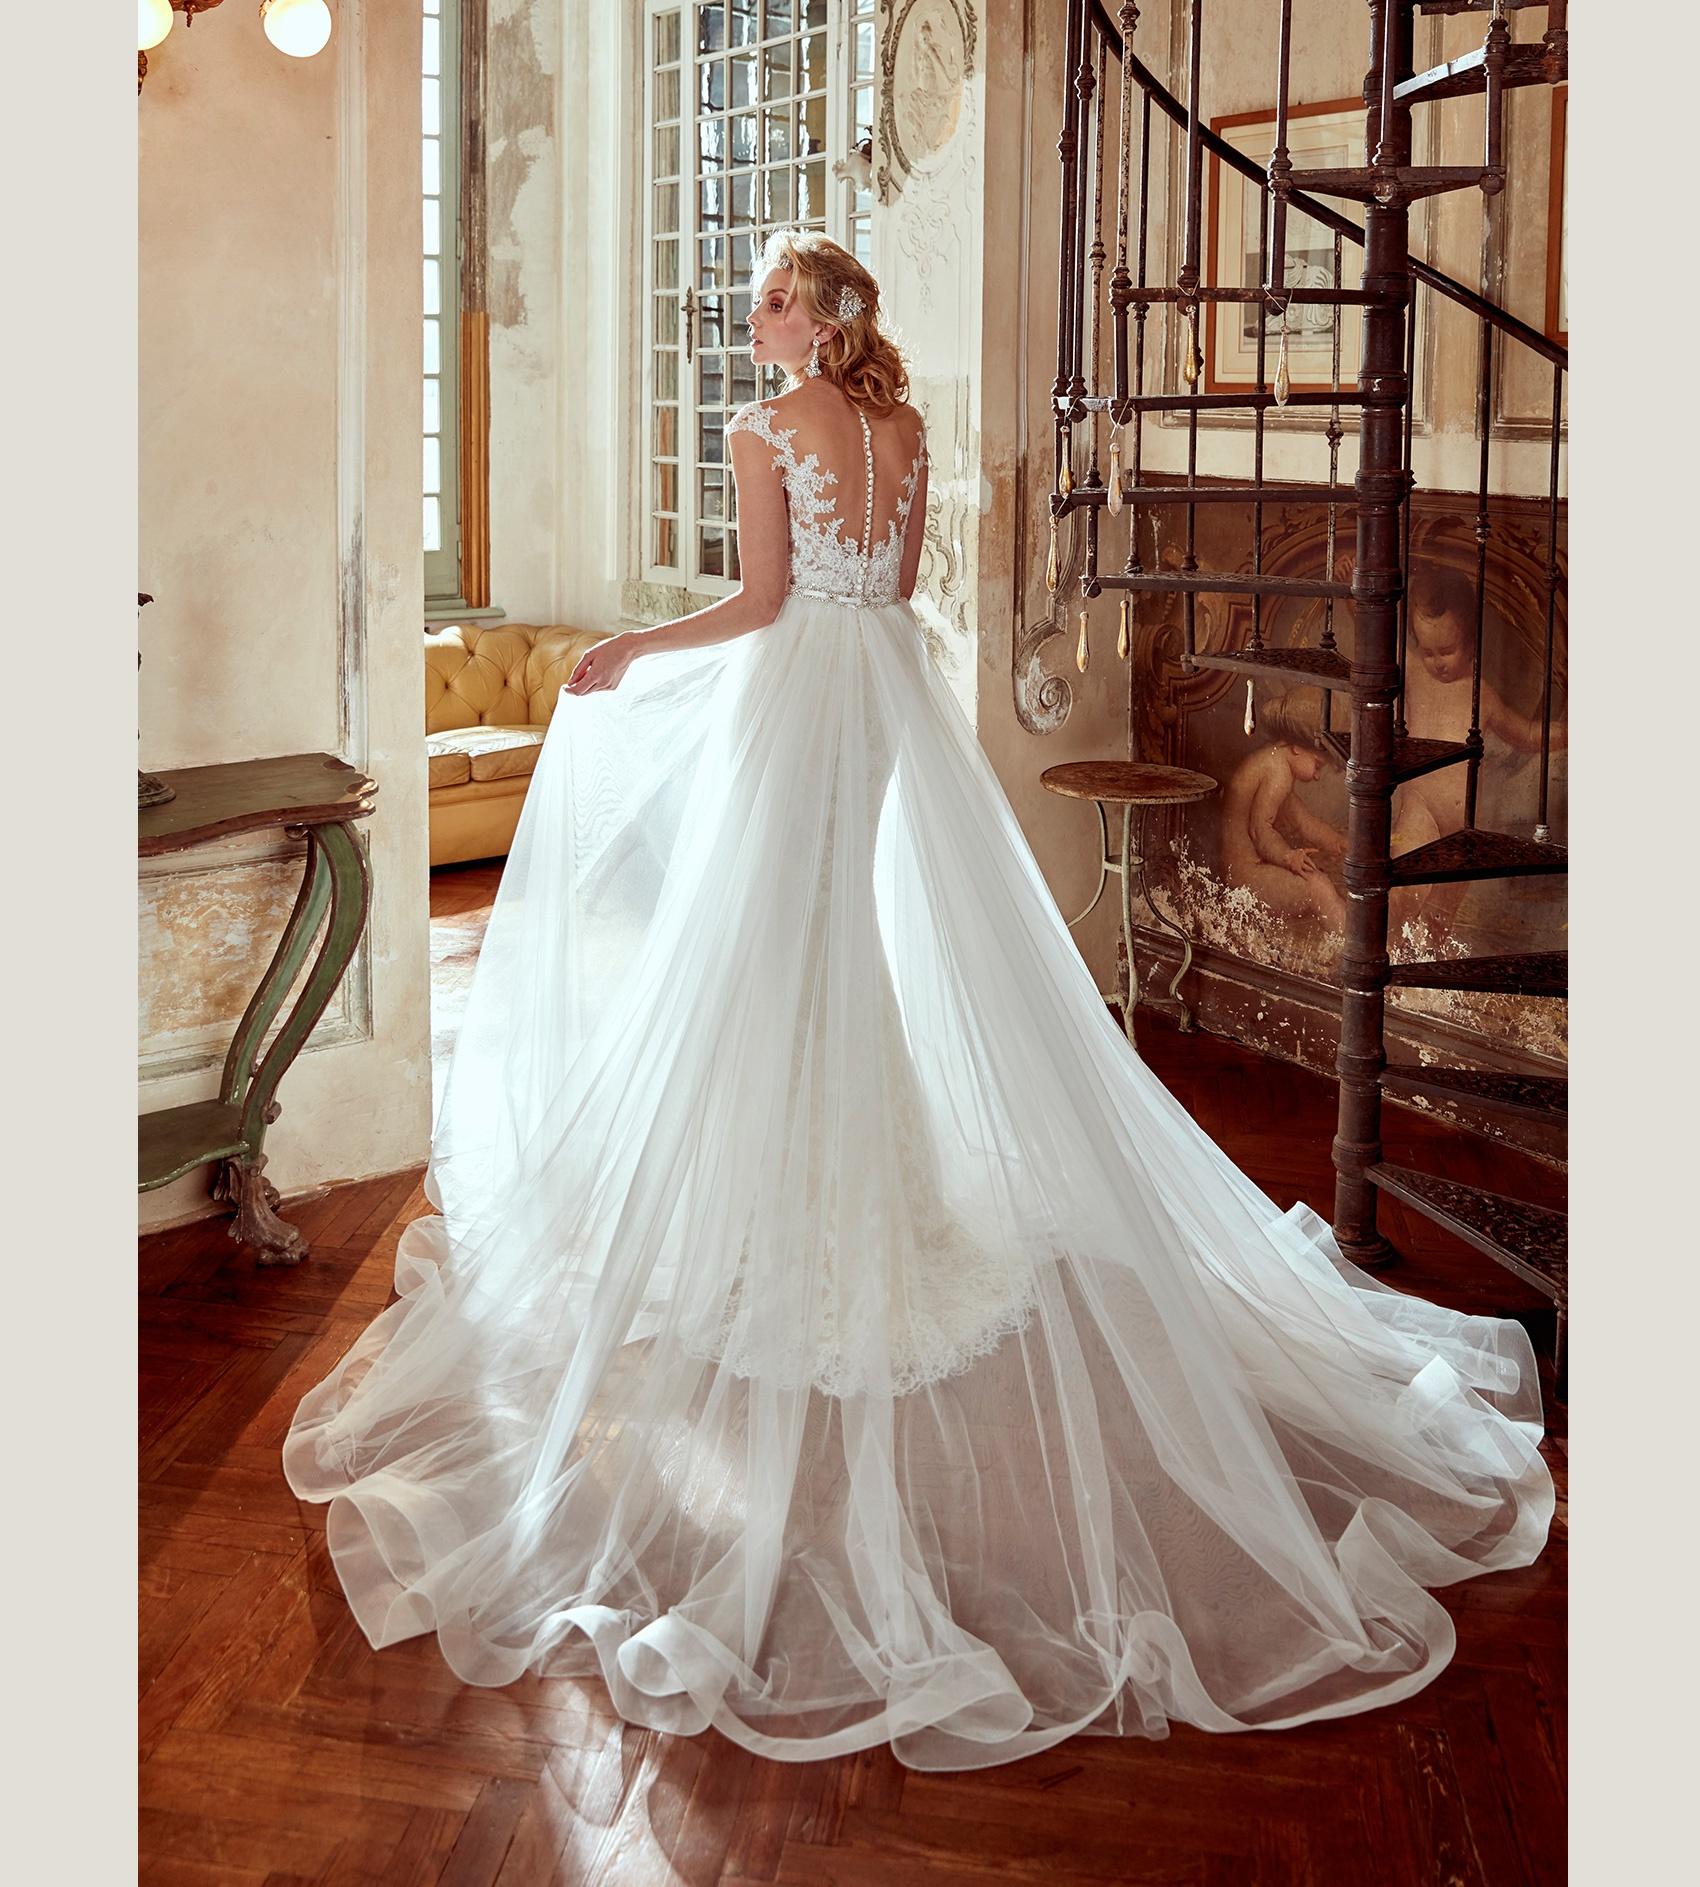 nicole-spose-NIAB17116-Nicole-moda-sposa-2017-343.jpg